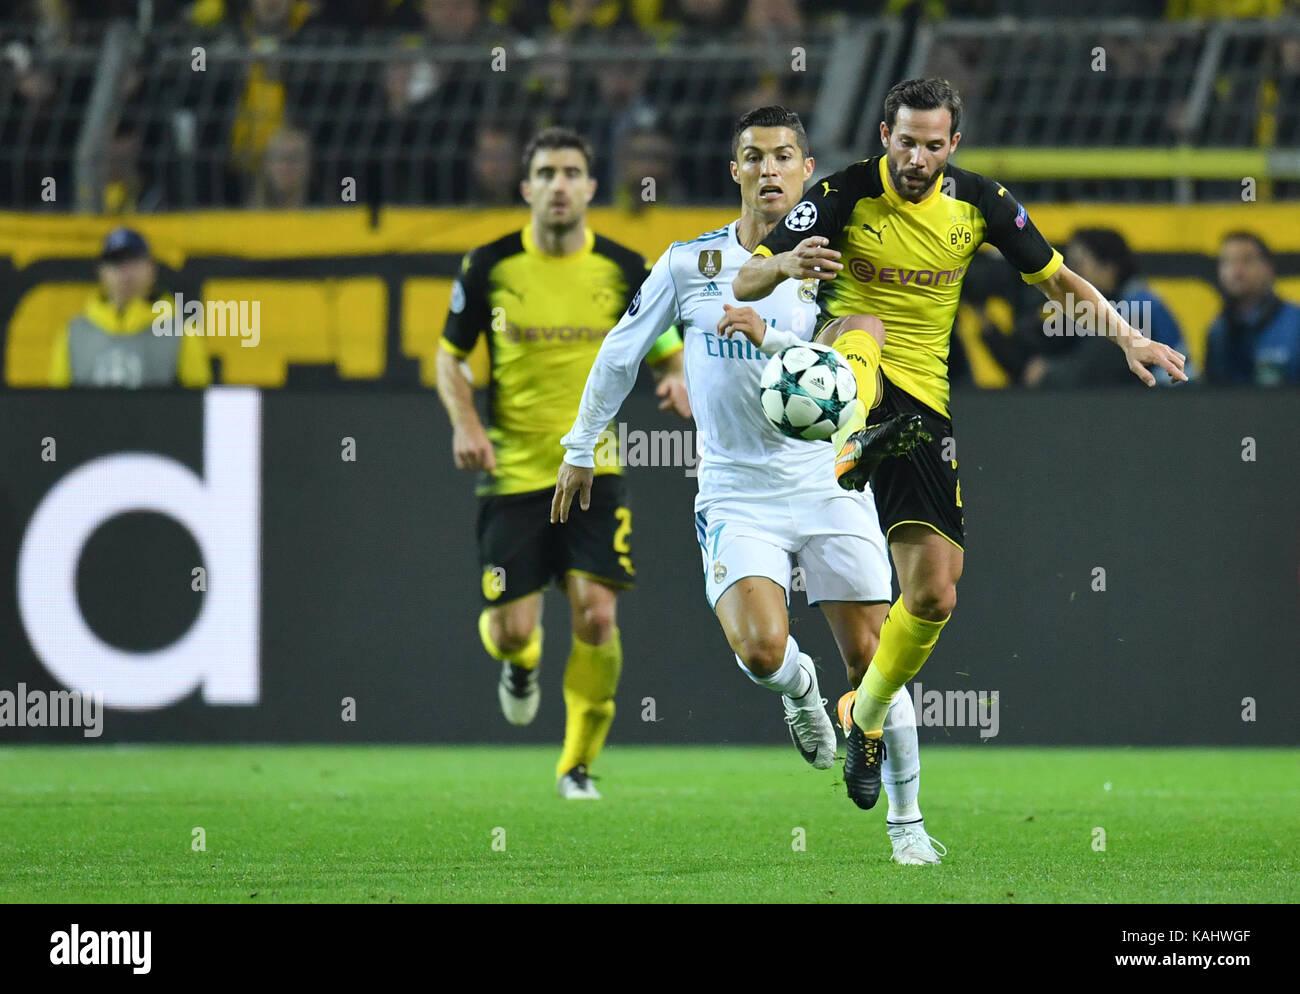 Fußball: UEFA Champions League, Vorrunde 2. Spieltag Borussia Dortmund - Real Madrid am 26.09.2017 im Signal - Stock Image